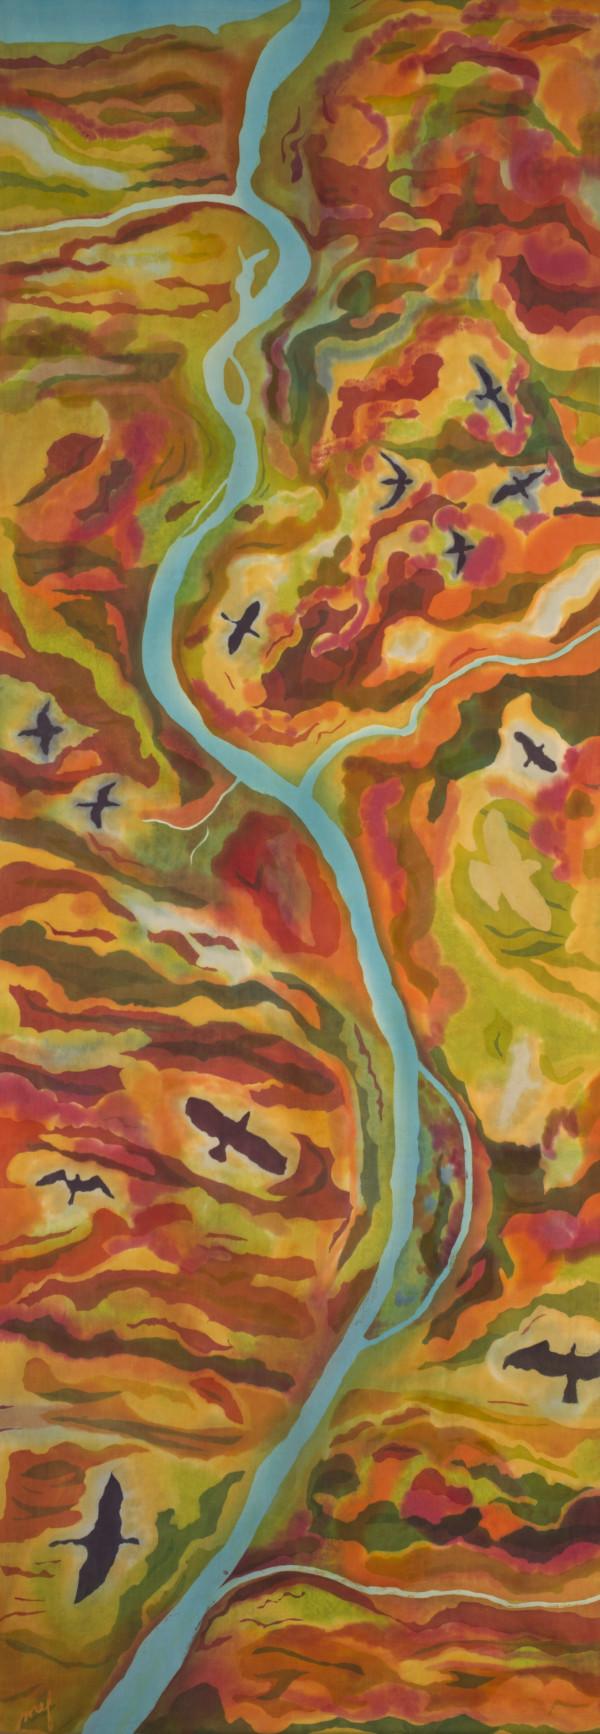 Lower Saluda River by Mary Edna Fraser